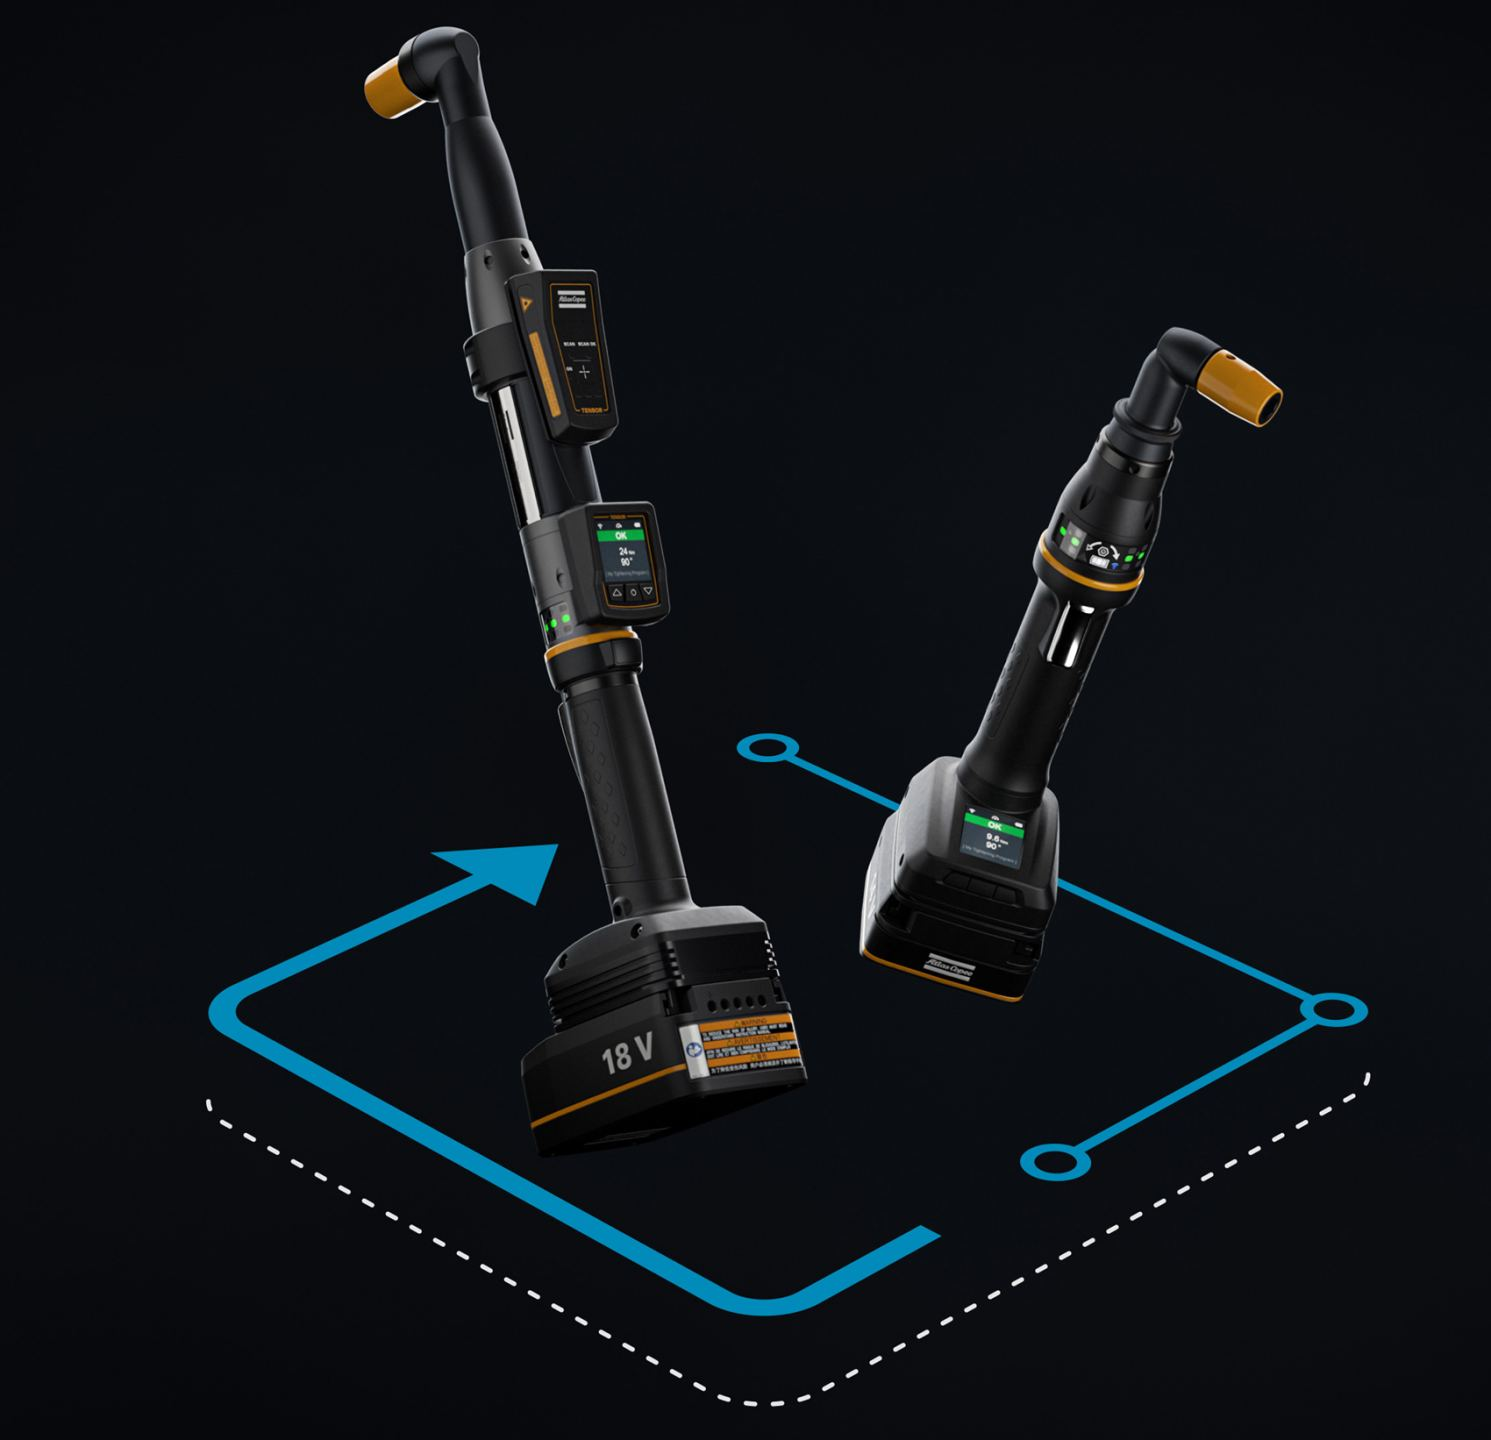 The Tensor IxB smart tool from Atlas Copco